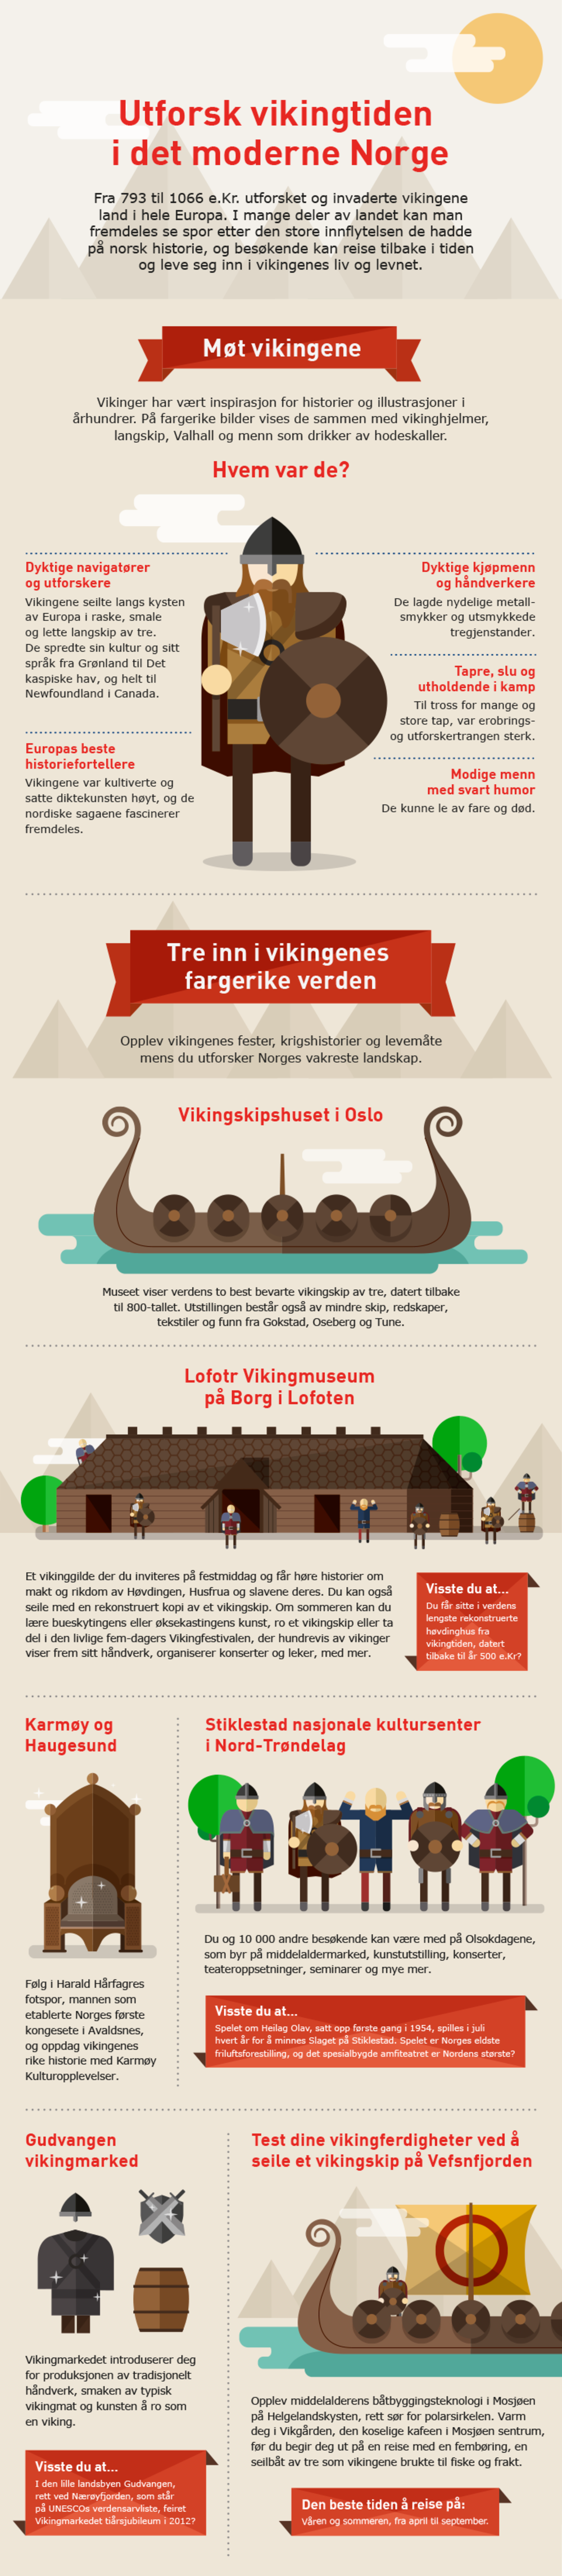 Viking Infographic Norway